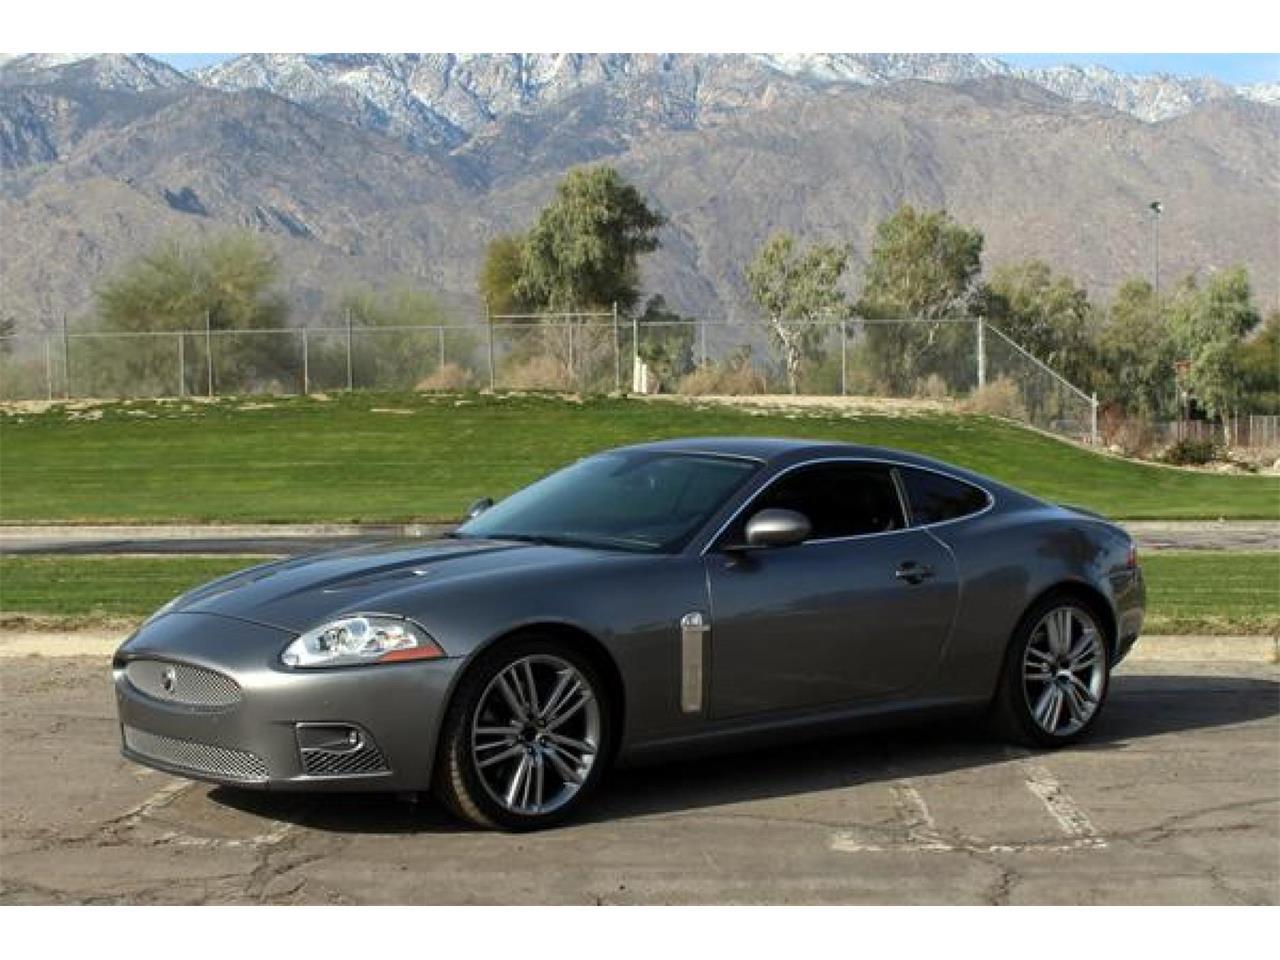 2009 Jaguar XKR Portfolio for Sale | ClassicCars.com | CC-955241